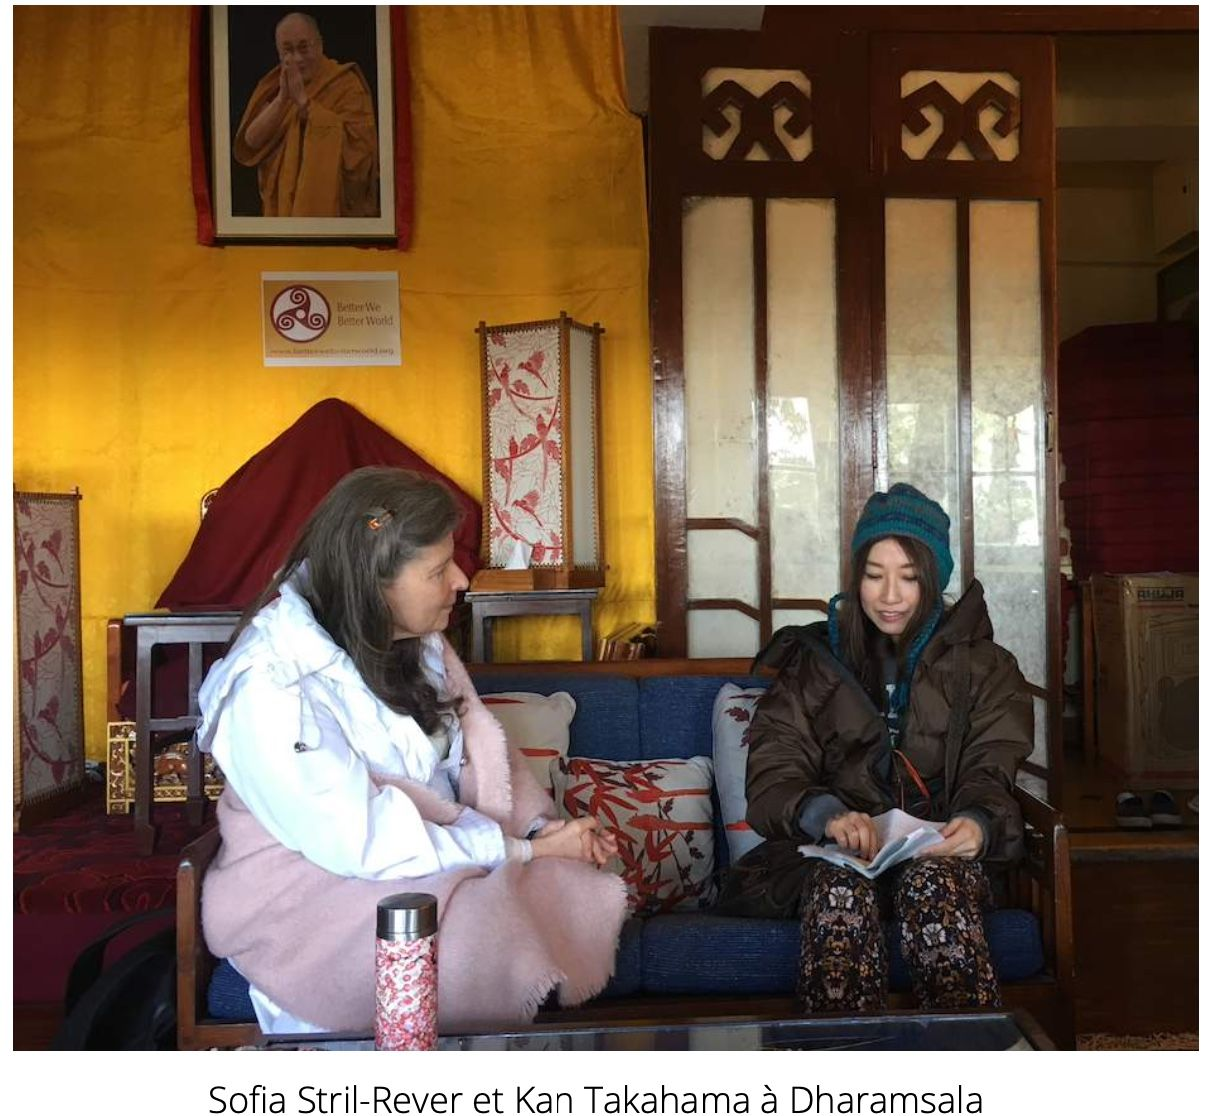 Sofia_Stril-Rever_et_Kan_Takahama_a__Dharamsala.jpg